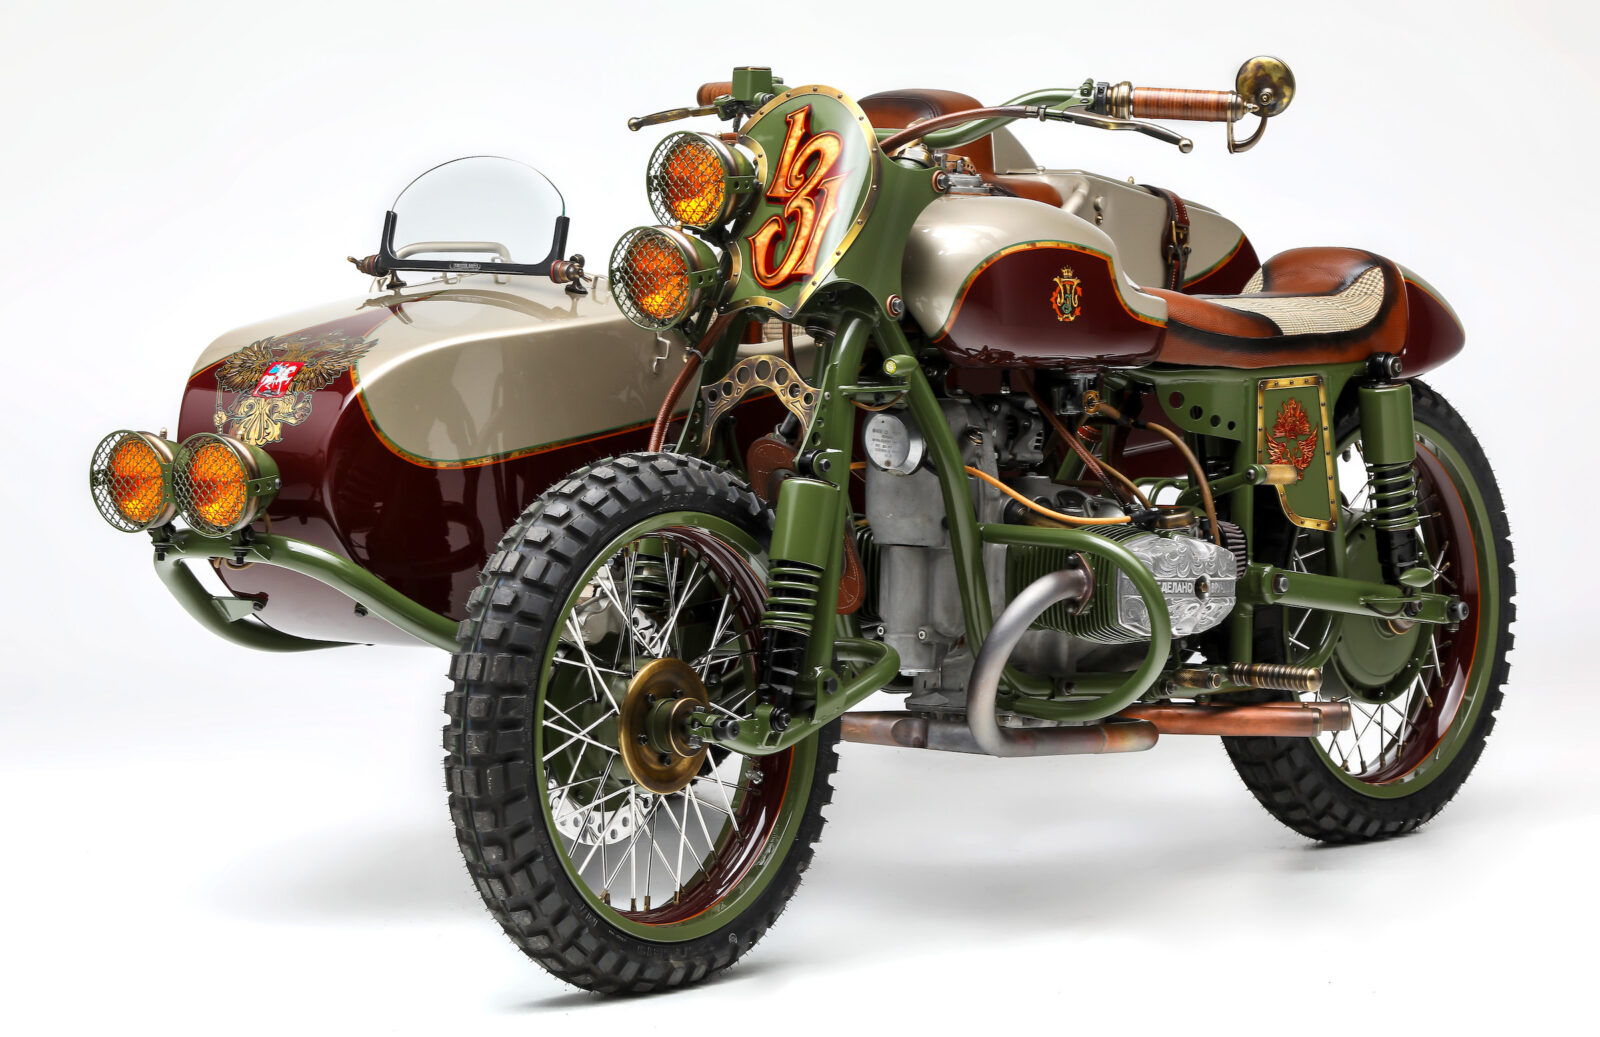 Sidecar fender for motorcycle URAL.